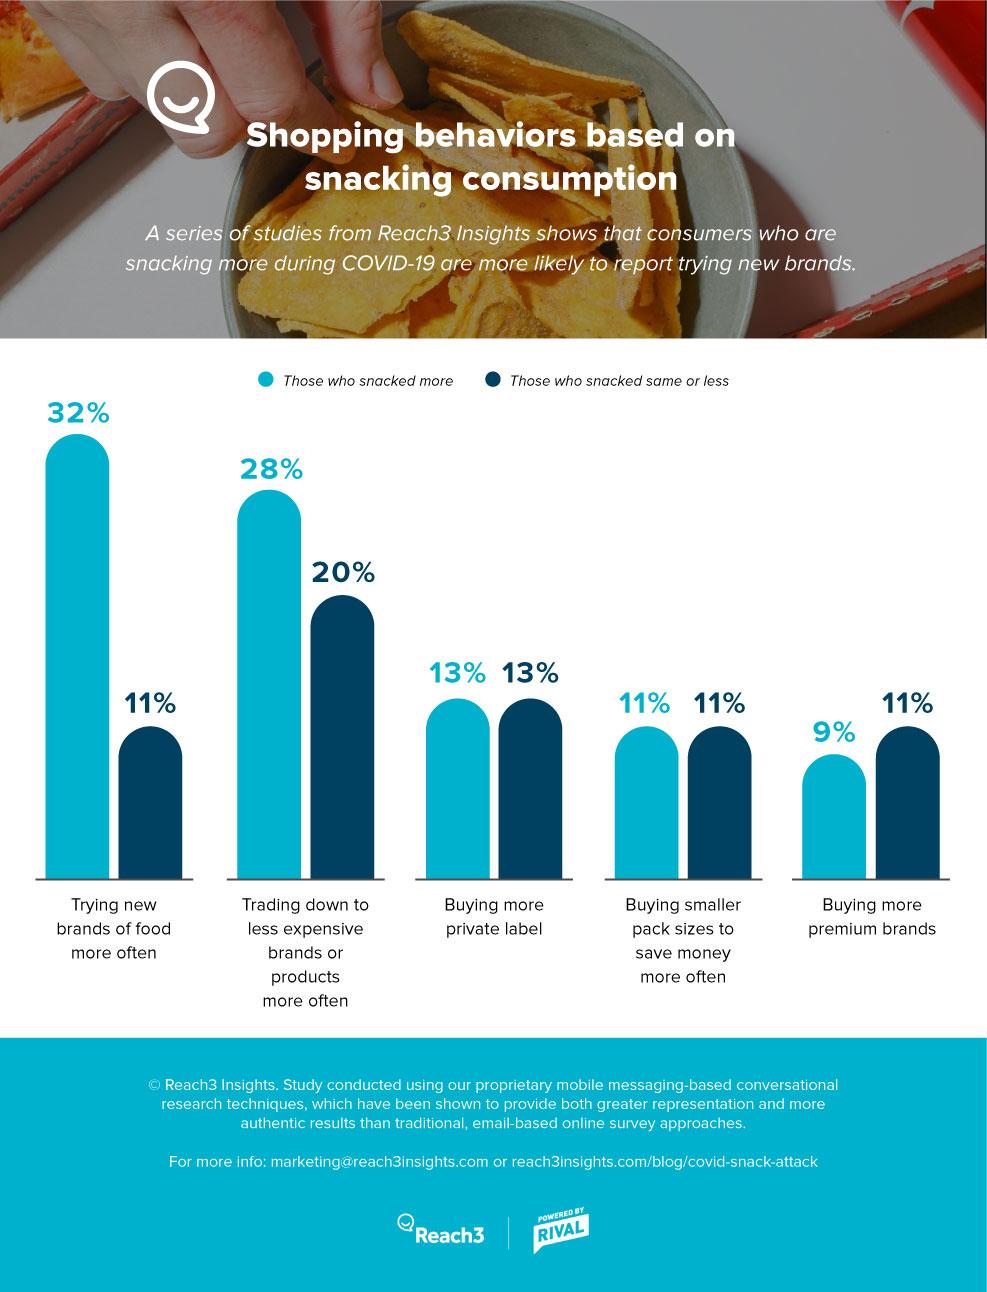 shopping-behaviors-based-on-snacking-consumption